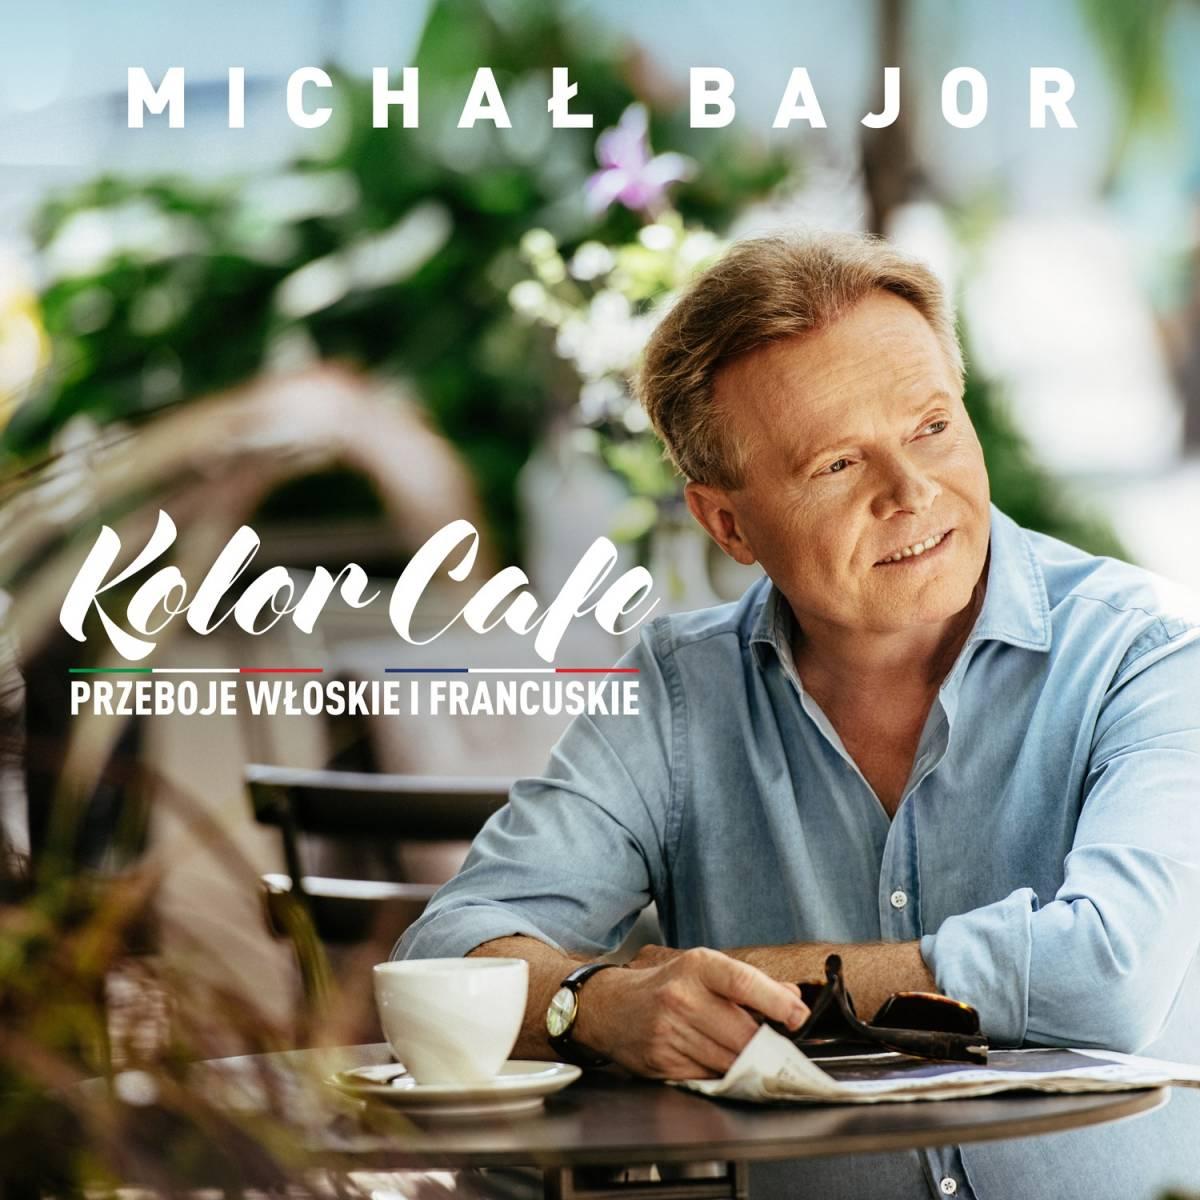 Michał Bajor - Kolor Cafe